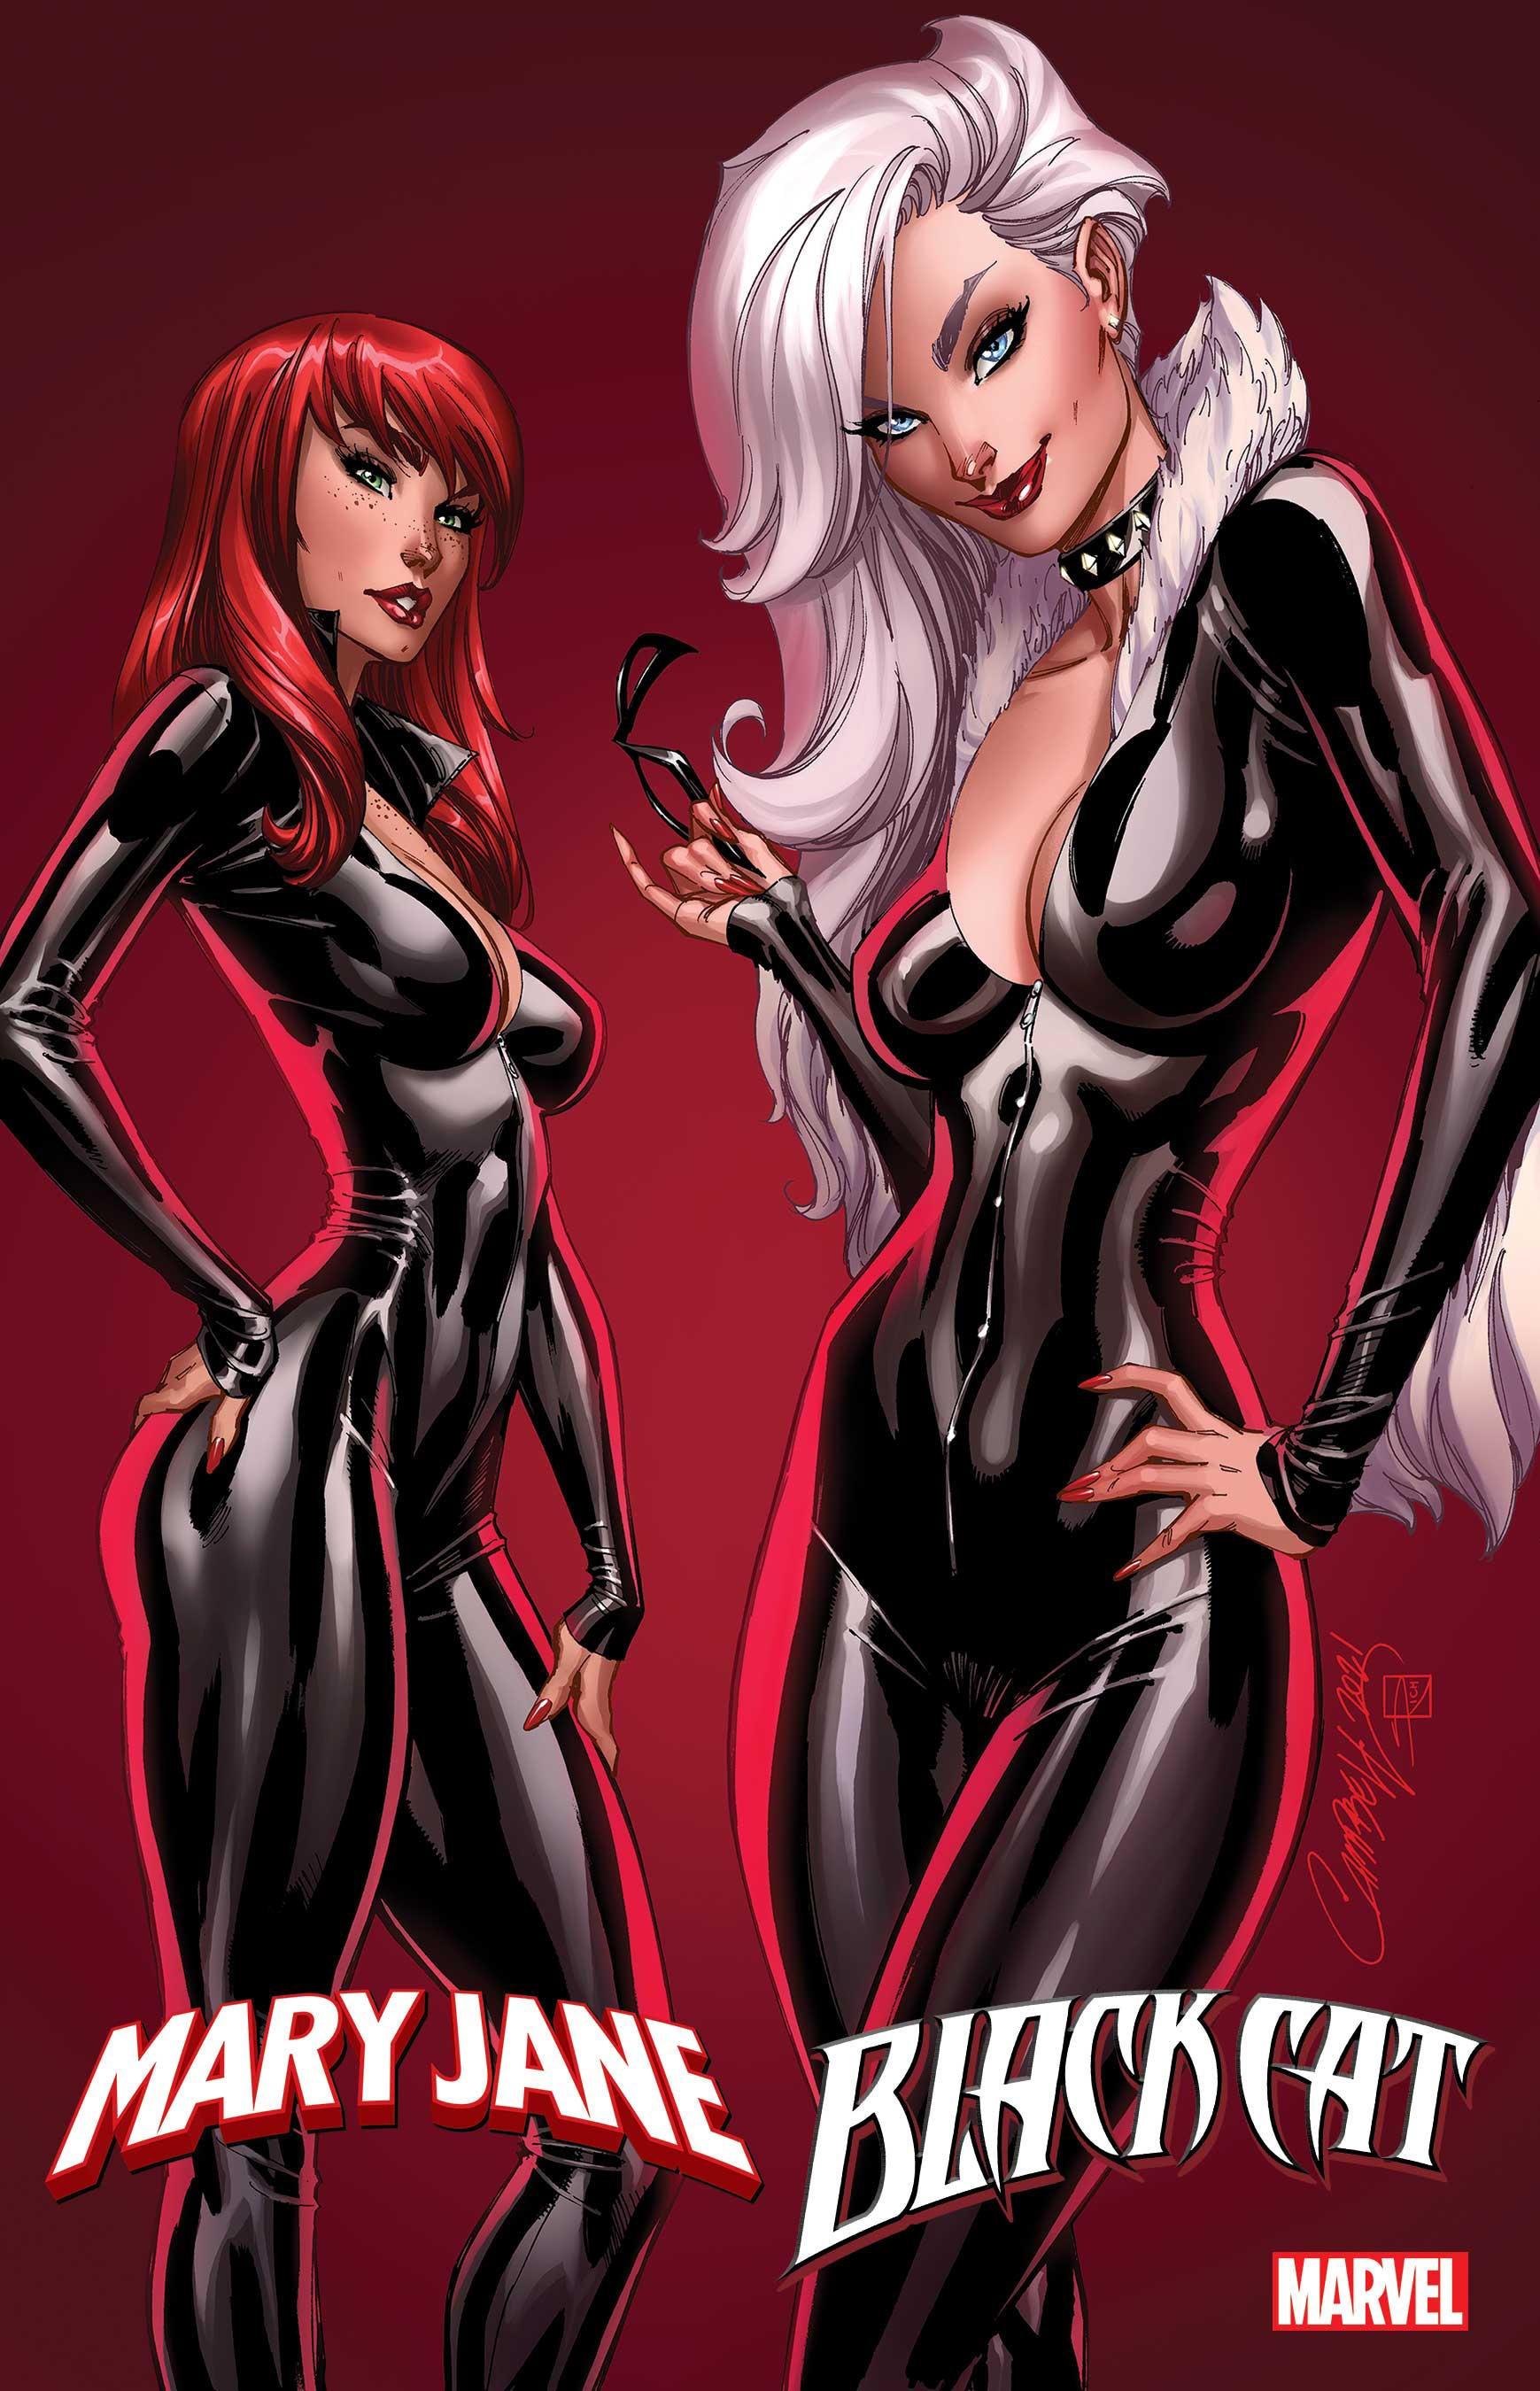 mary-jane-black-cat-beyond-cover.jpg